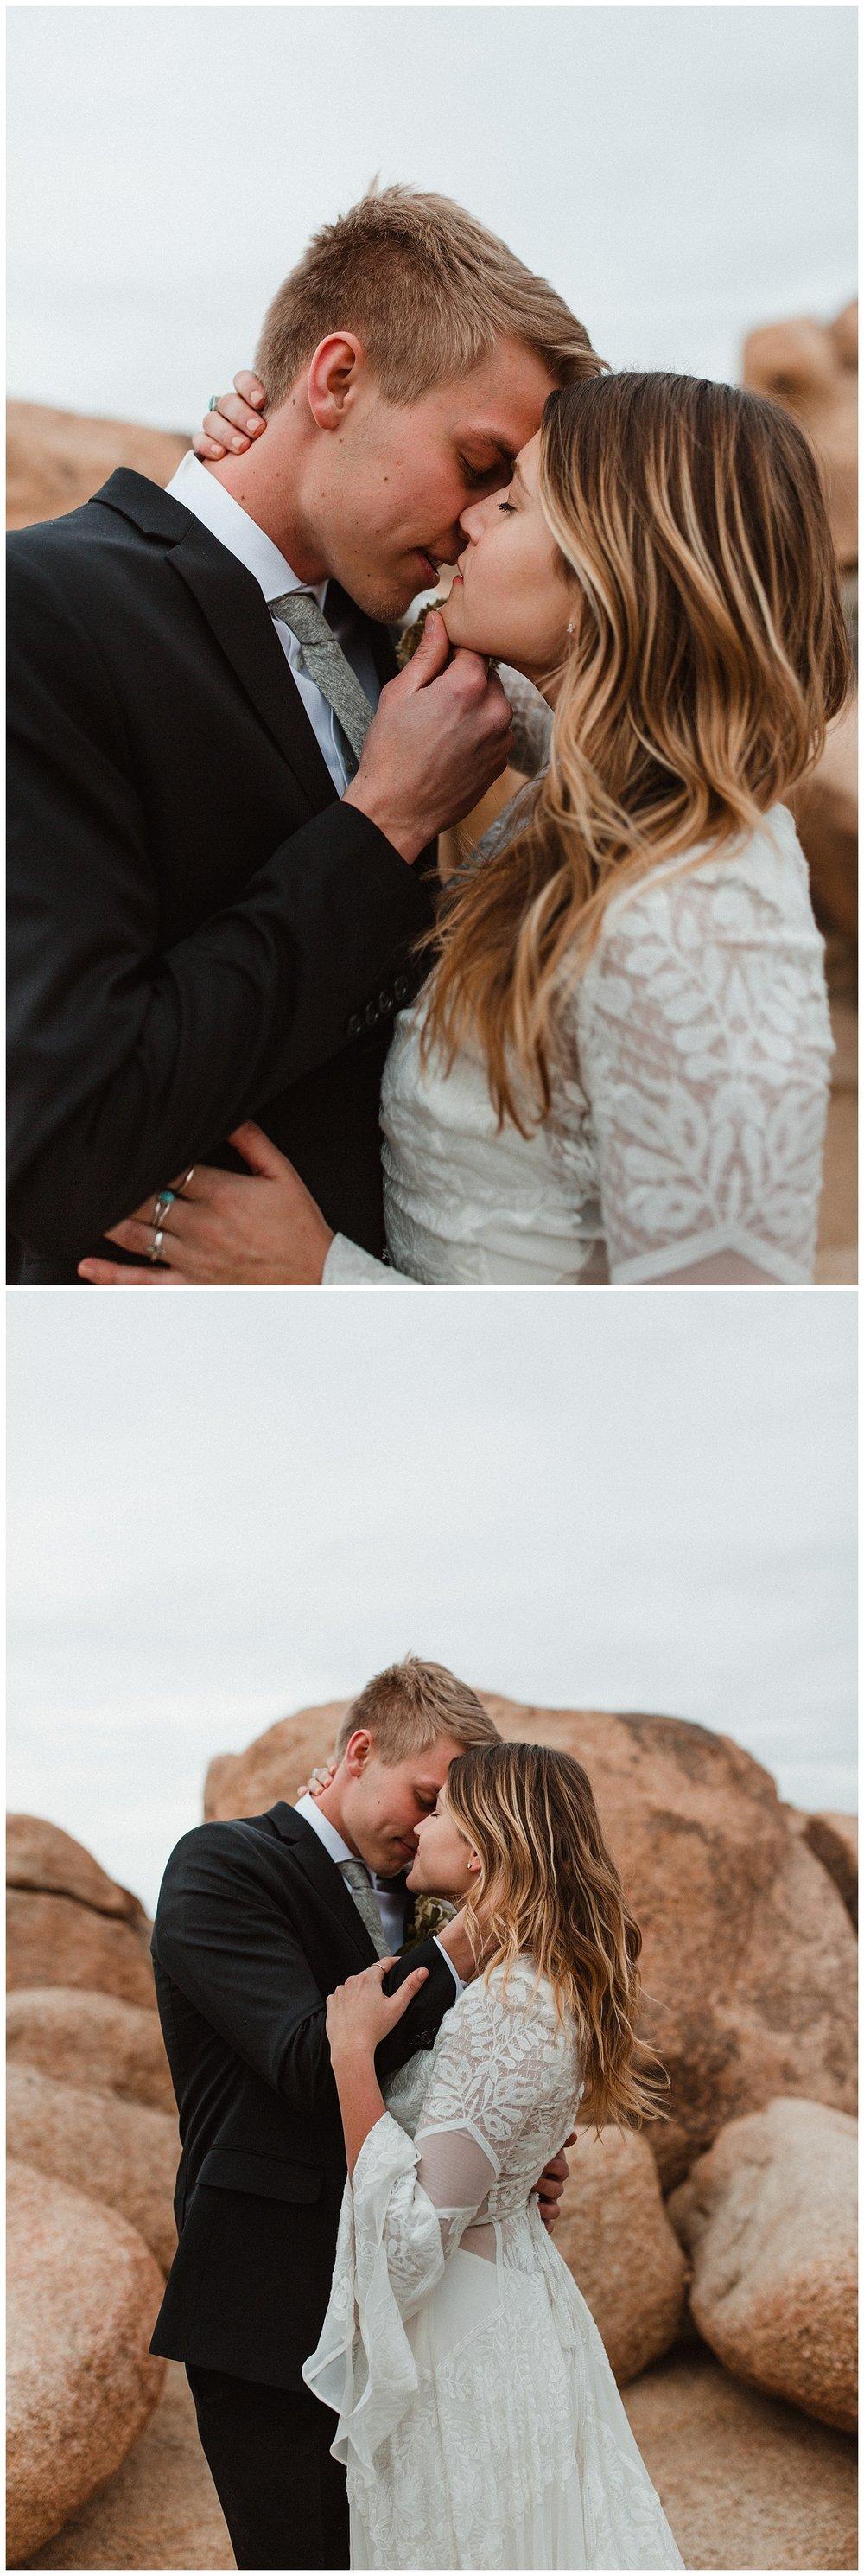 romantic_elopement_joshua_tree_adventurous_wedding_photographer_romantic_intimate_wedding_0013.jpg